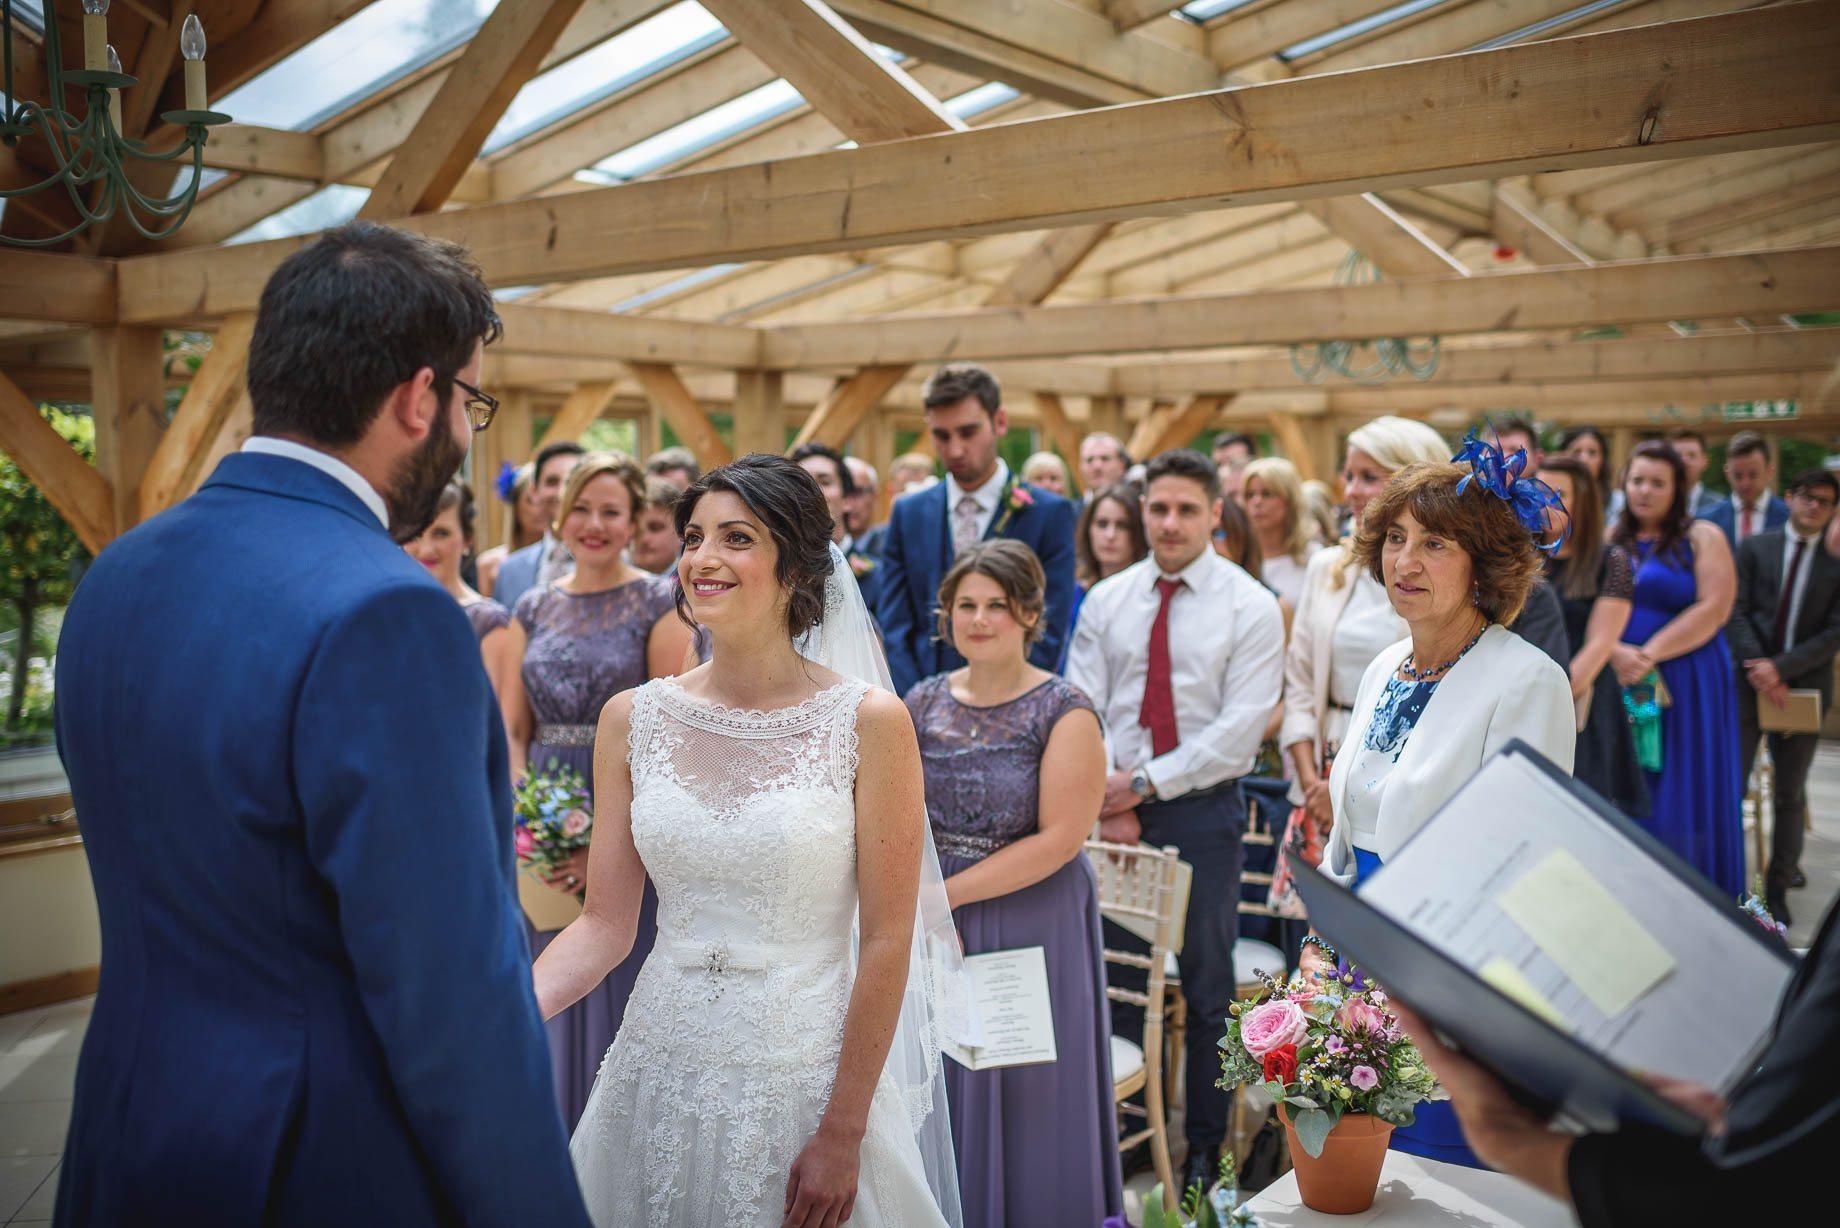 Gaynes Park wedding photography - Guy Collier Photography - Rachel and Jon (69 of 169)